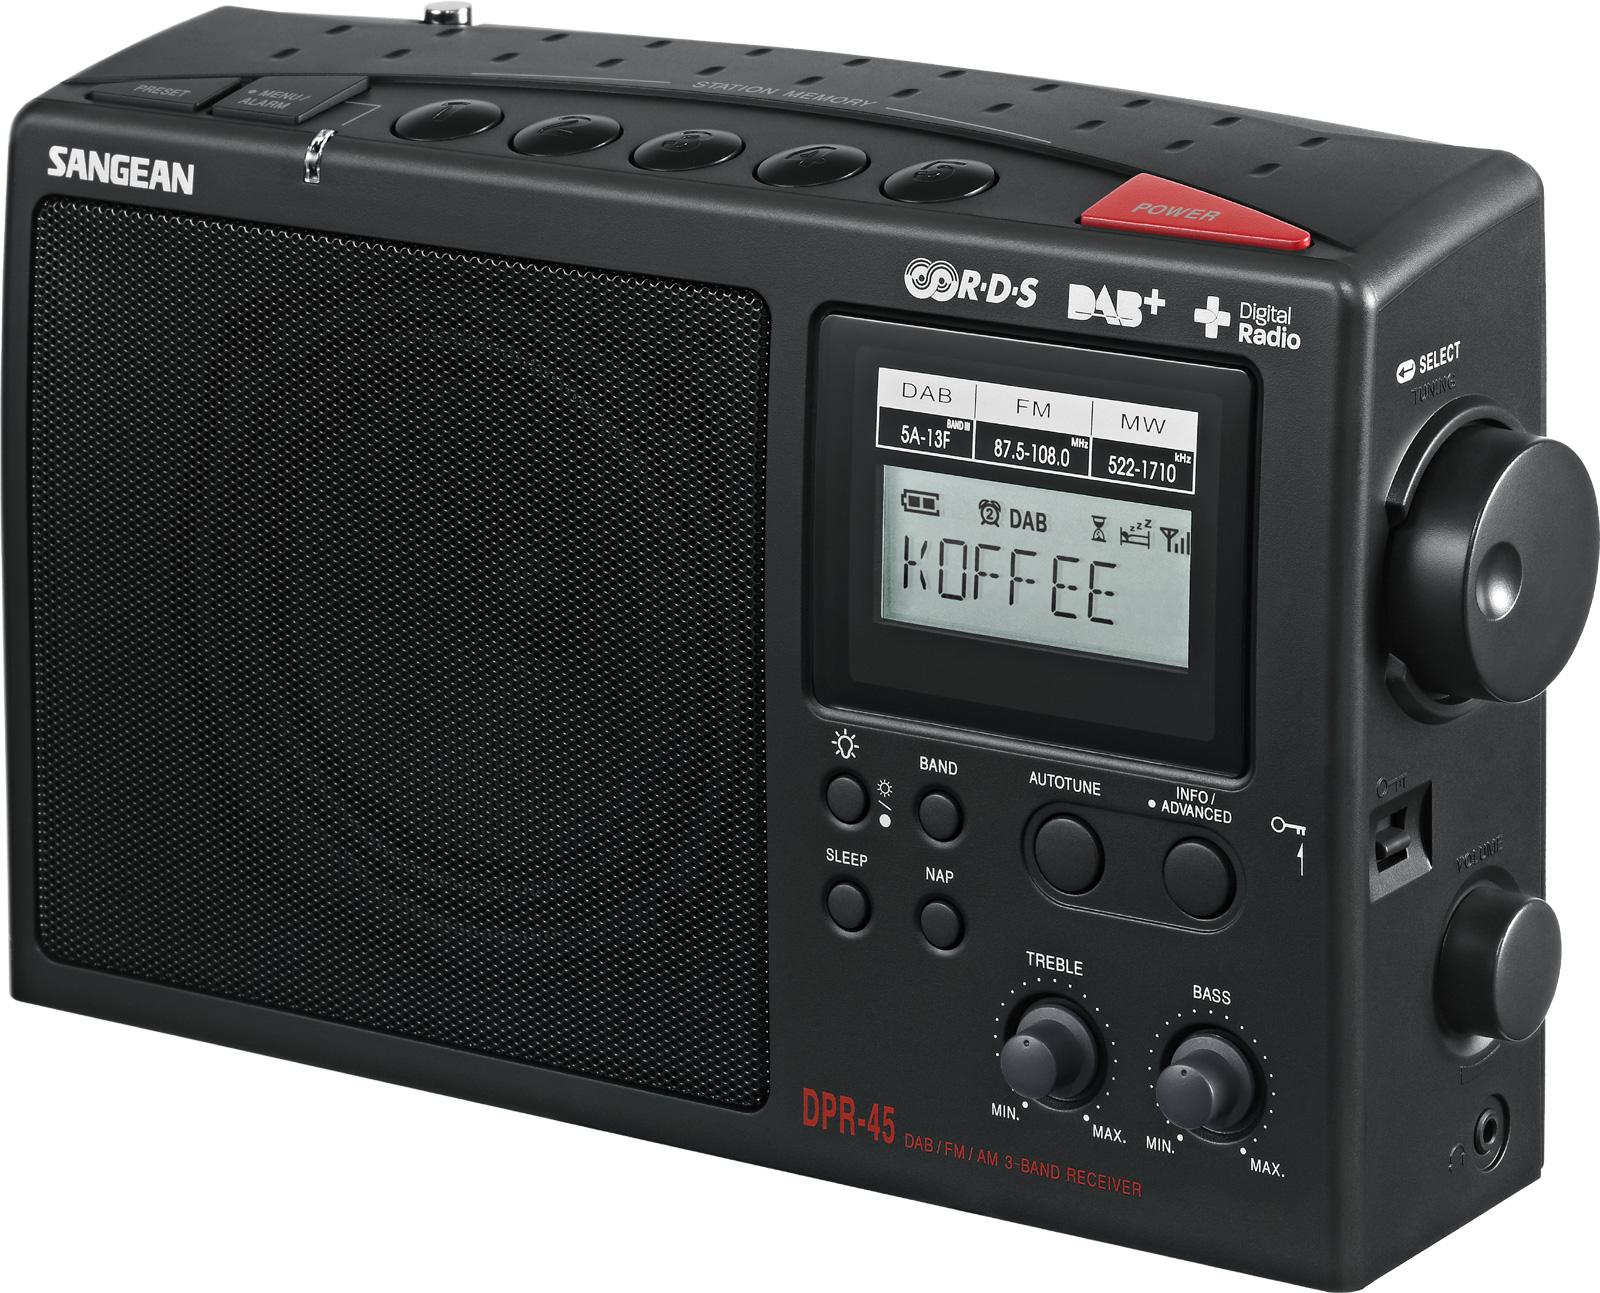 sangean am dab fm rds portable digital radio av. Black Bedroom Furniture Sets. Home Design Ideas